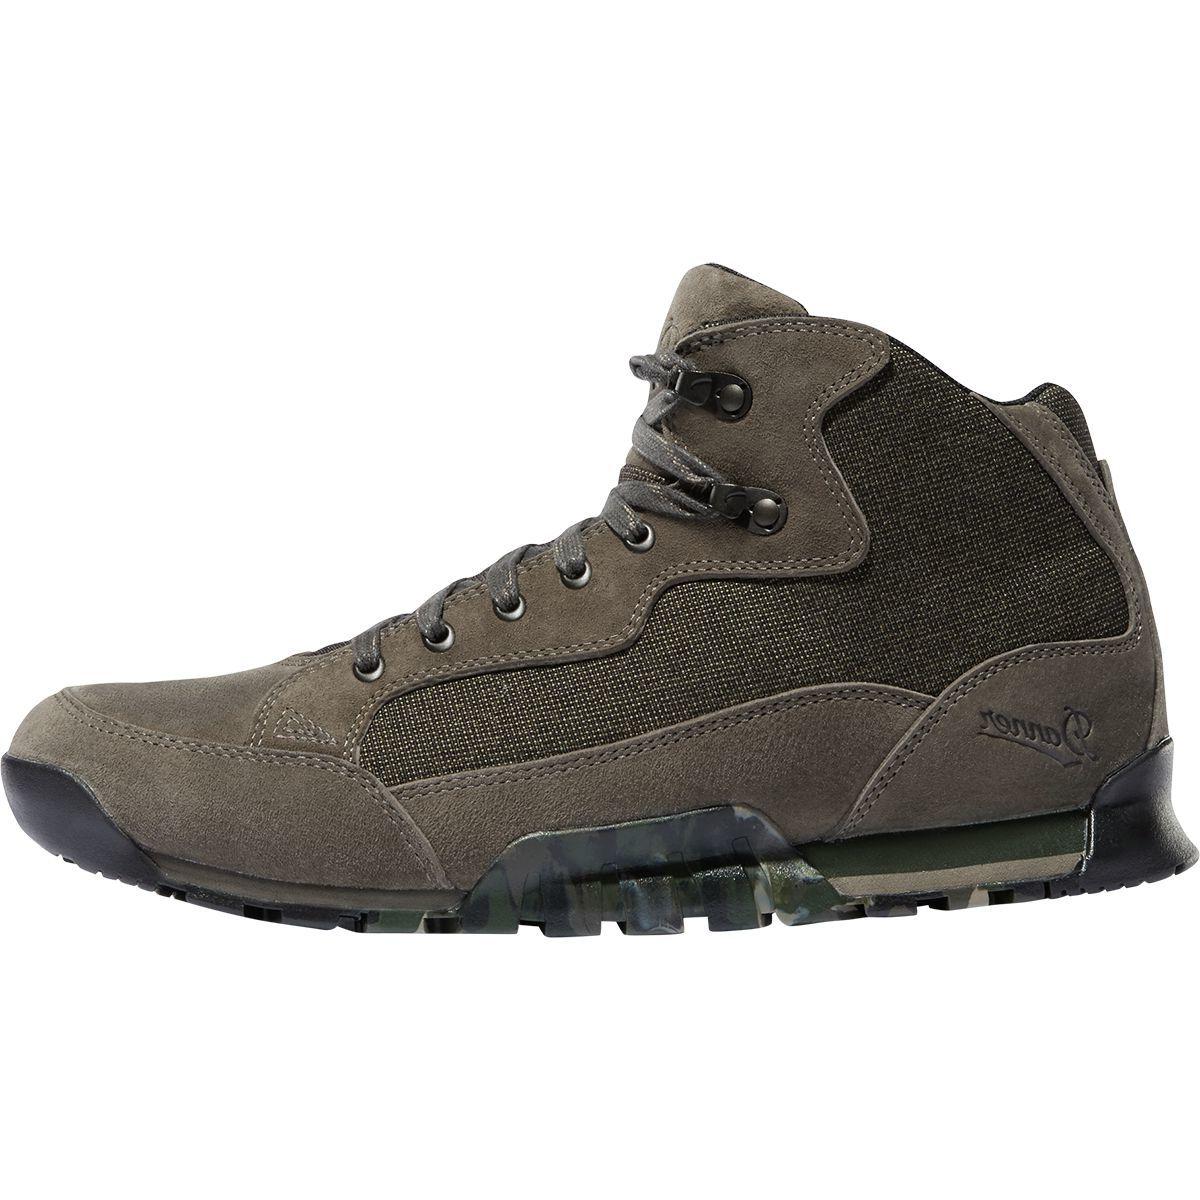 Danner Skyridge Boot - Men's